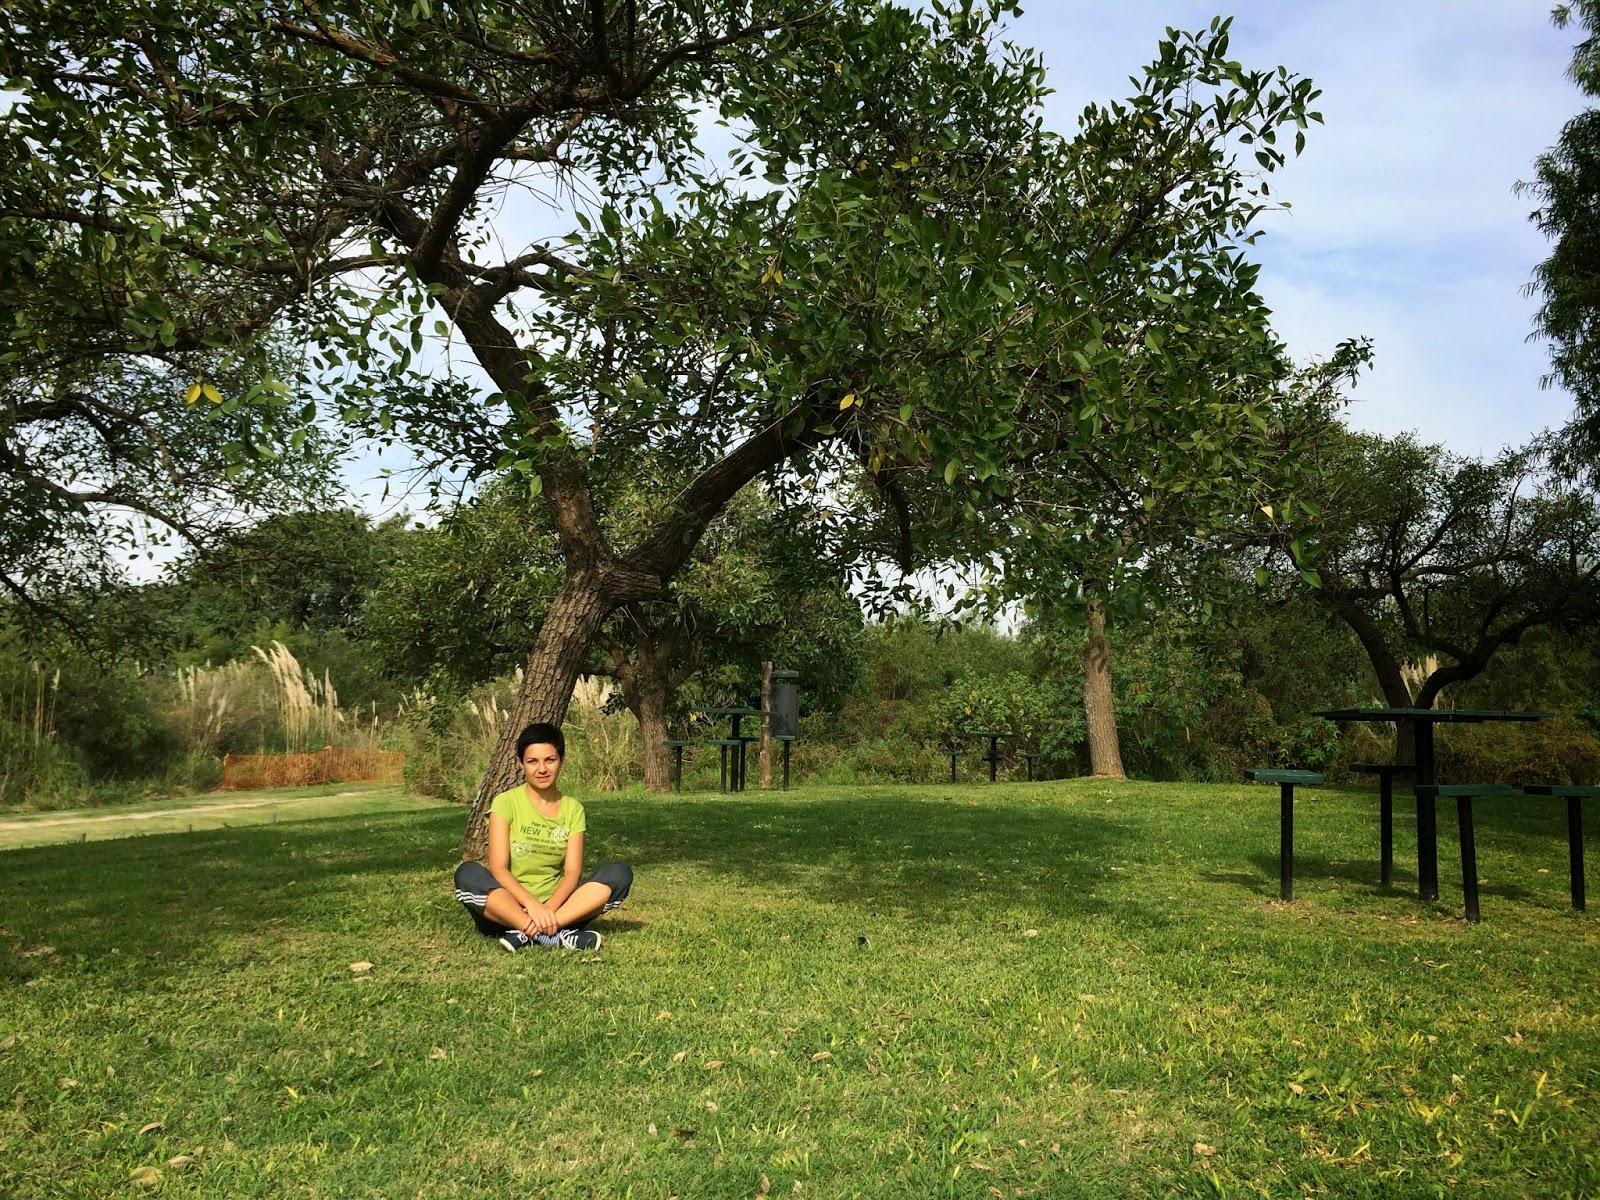 park_reserva_ecologica_argentina_12.jpg